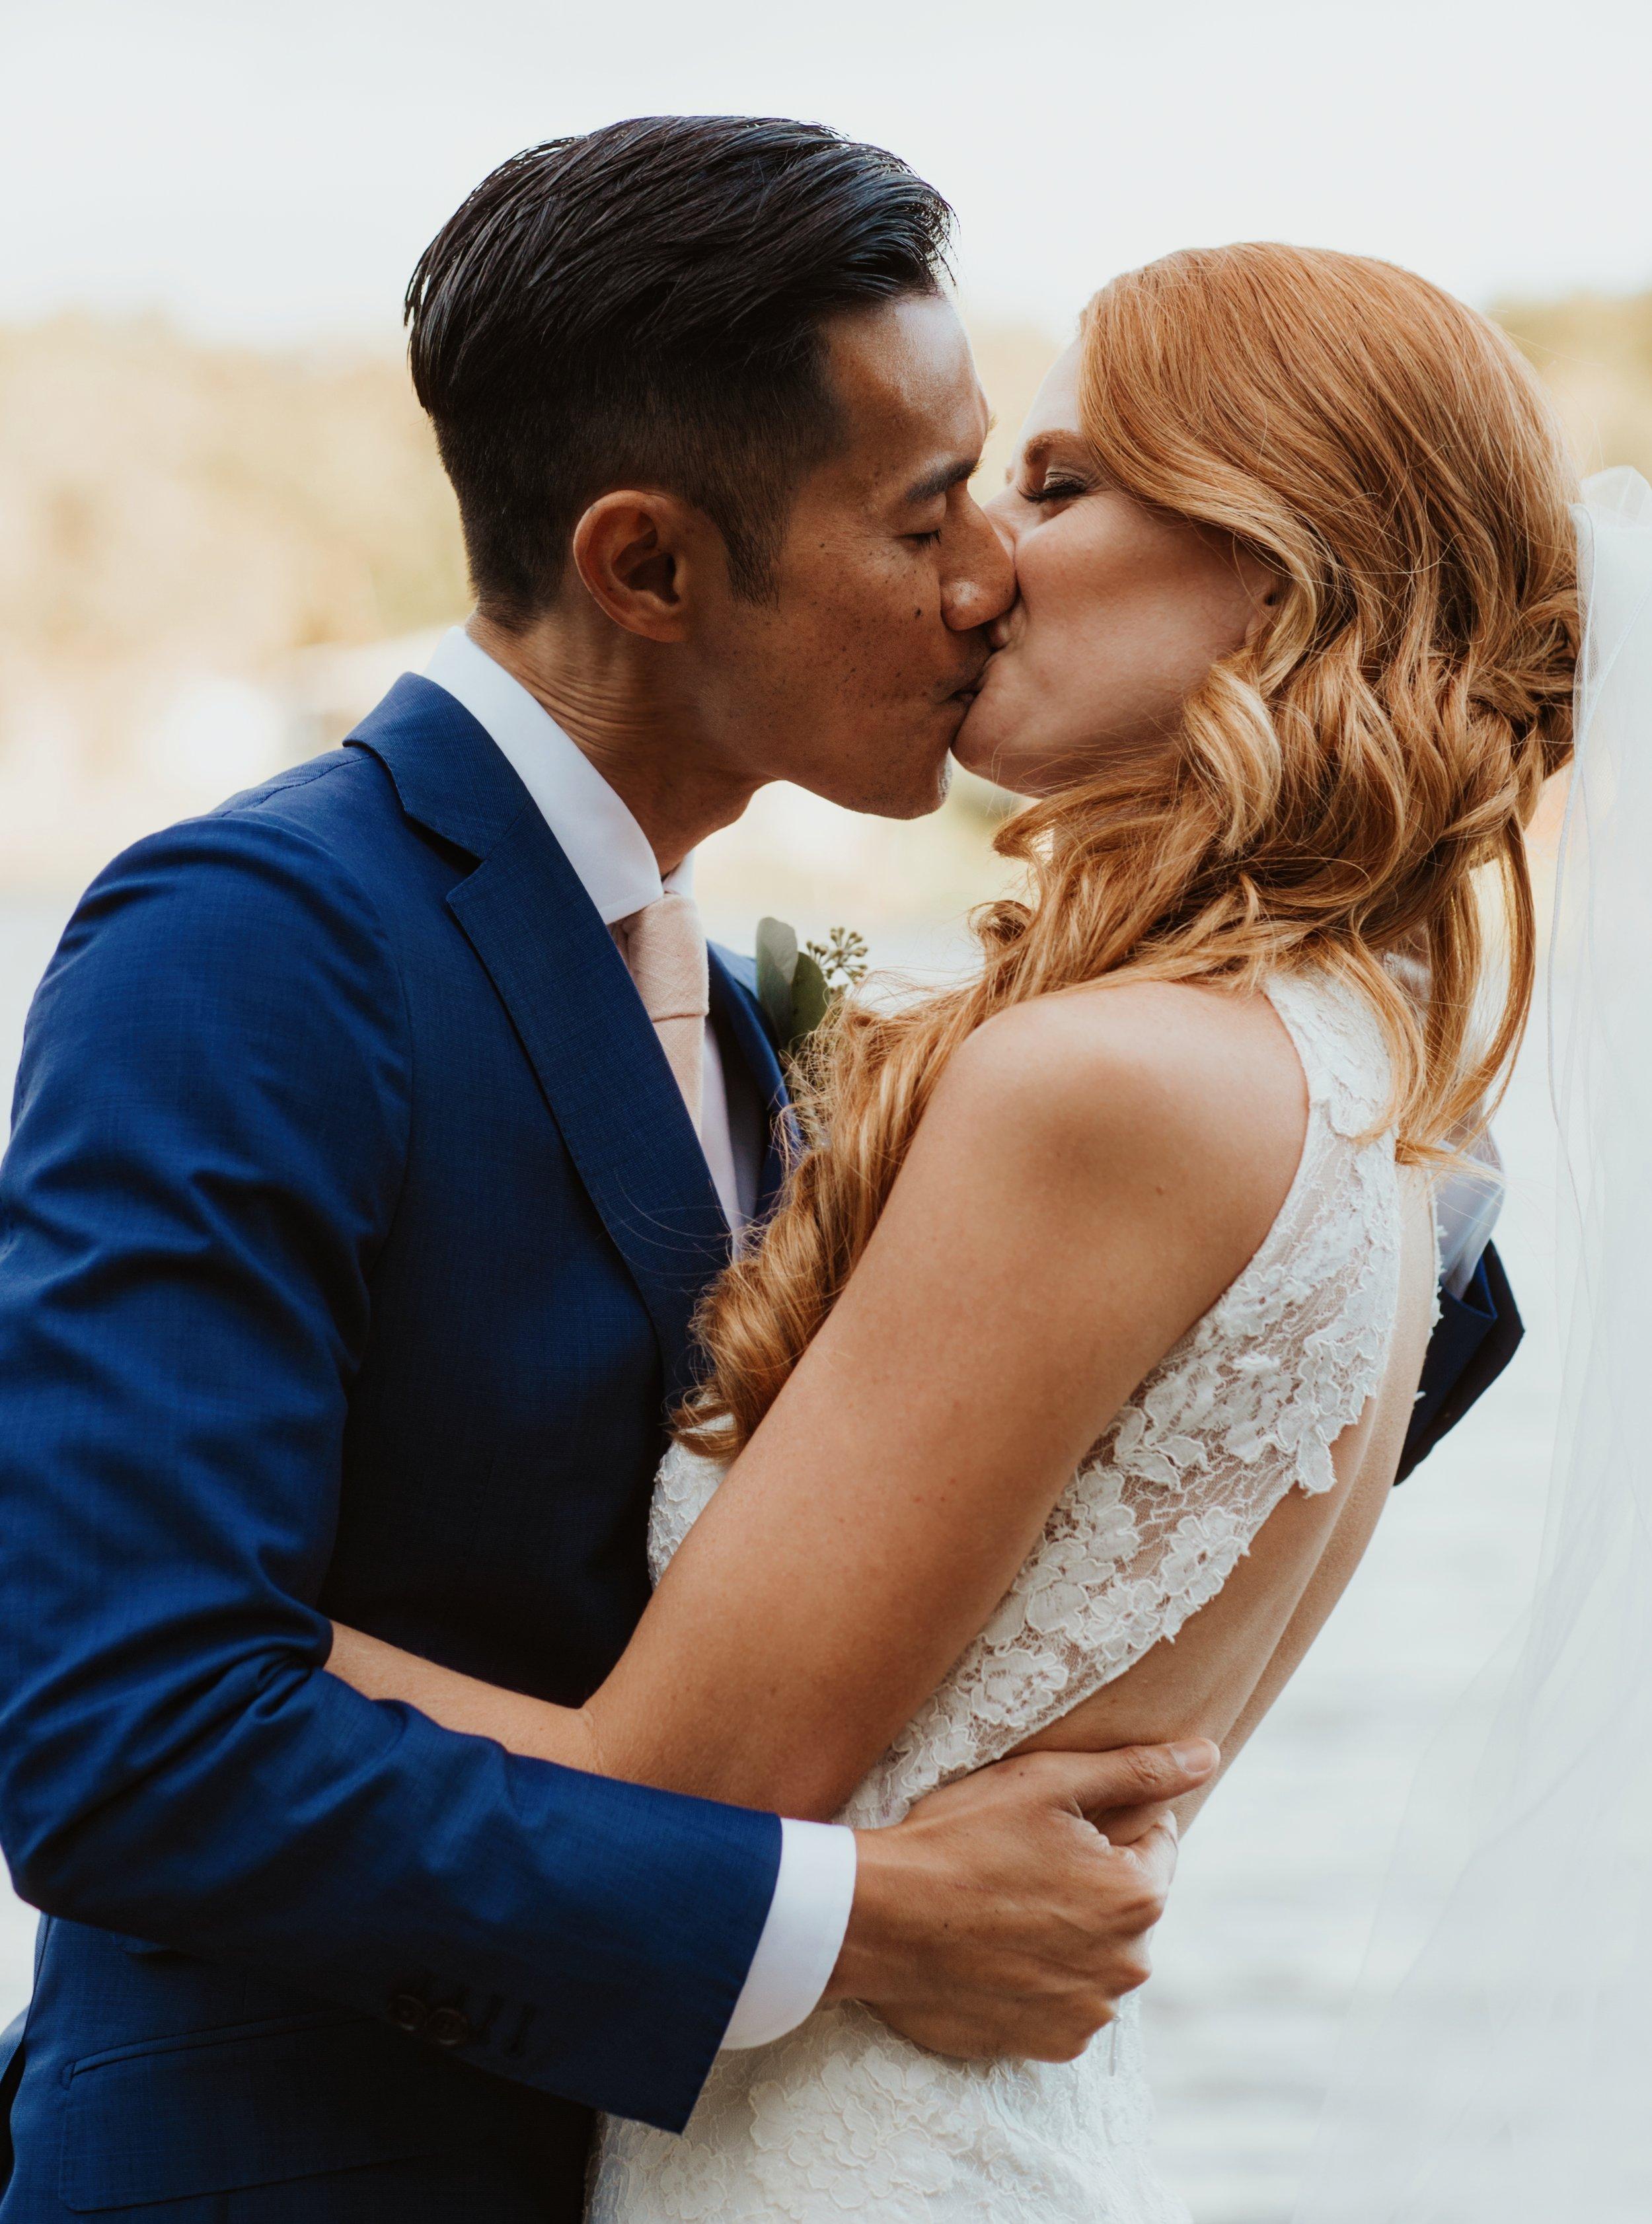 Wedding Day | Vanessa Boy | vanessaboy.com-850.com .jpg